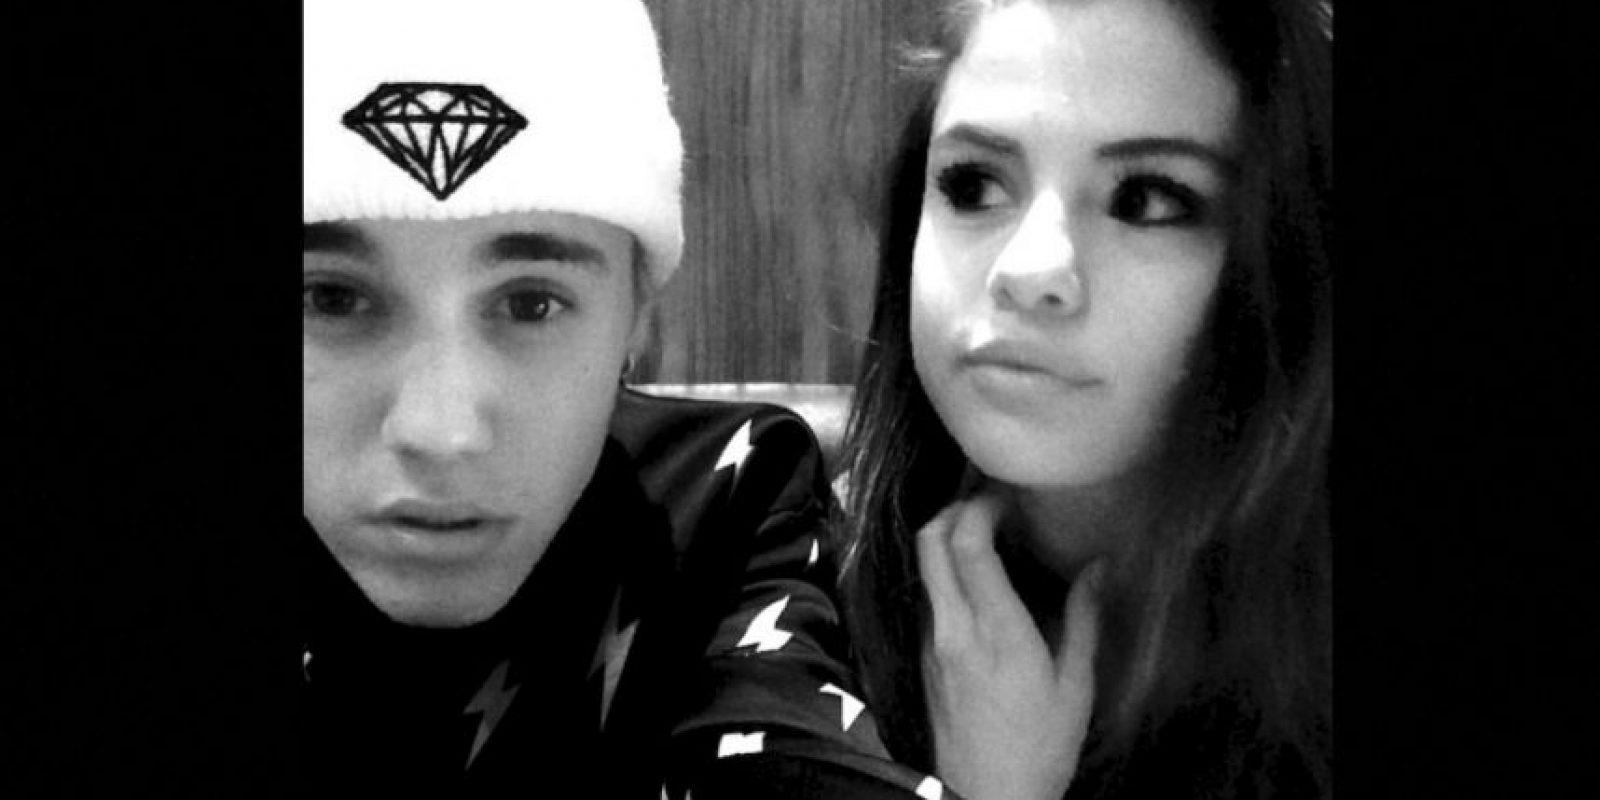 En 2011, la cuenta de Twitter de Selena Gomez se llenó de amenazas de muerte de parte de diversas fans de Justin Bieber. Foto:Instagram